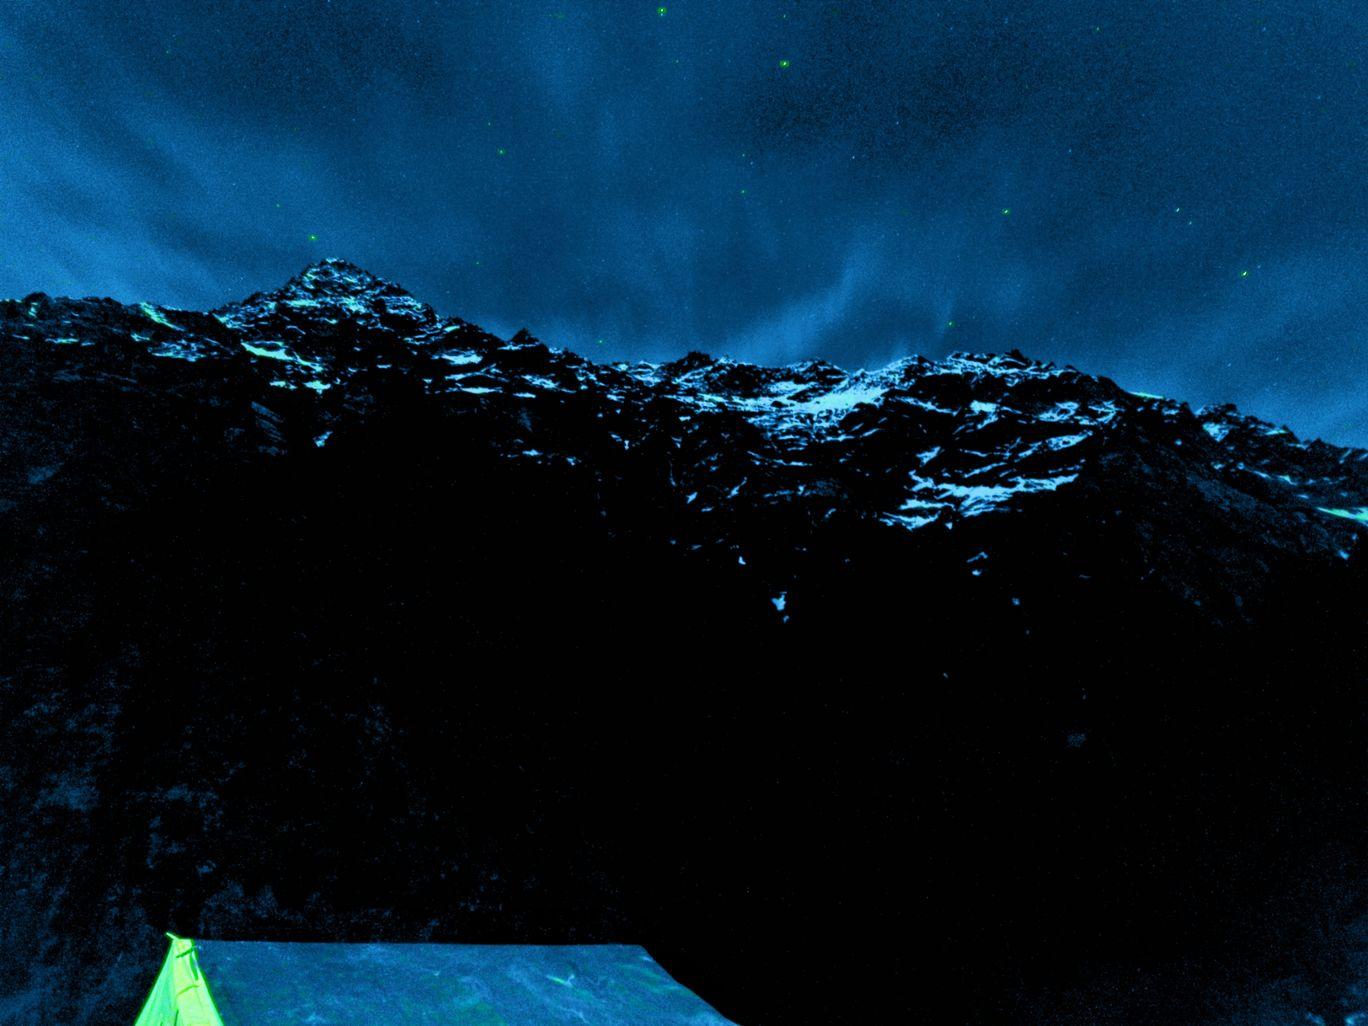 Photo of Kheerganga - Sunshine Himalayan Camp By KUNAL RAJPUT